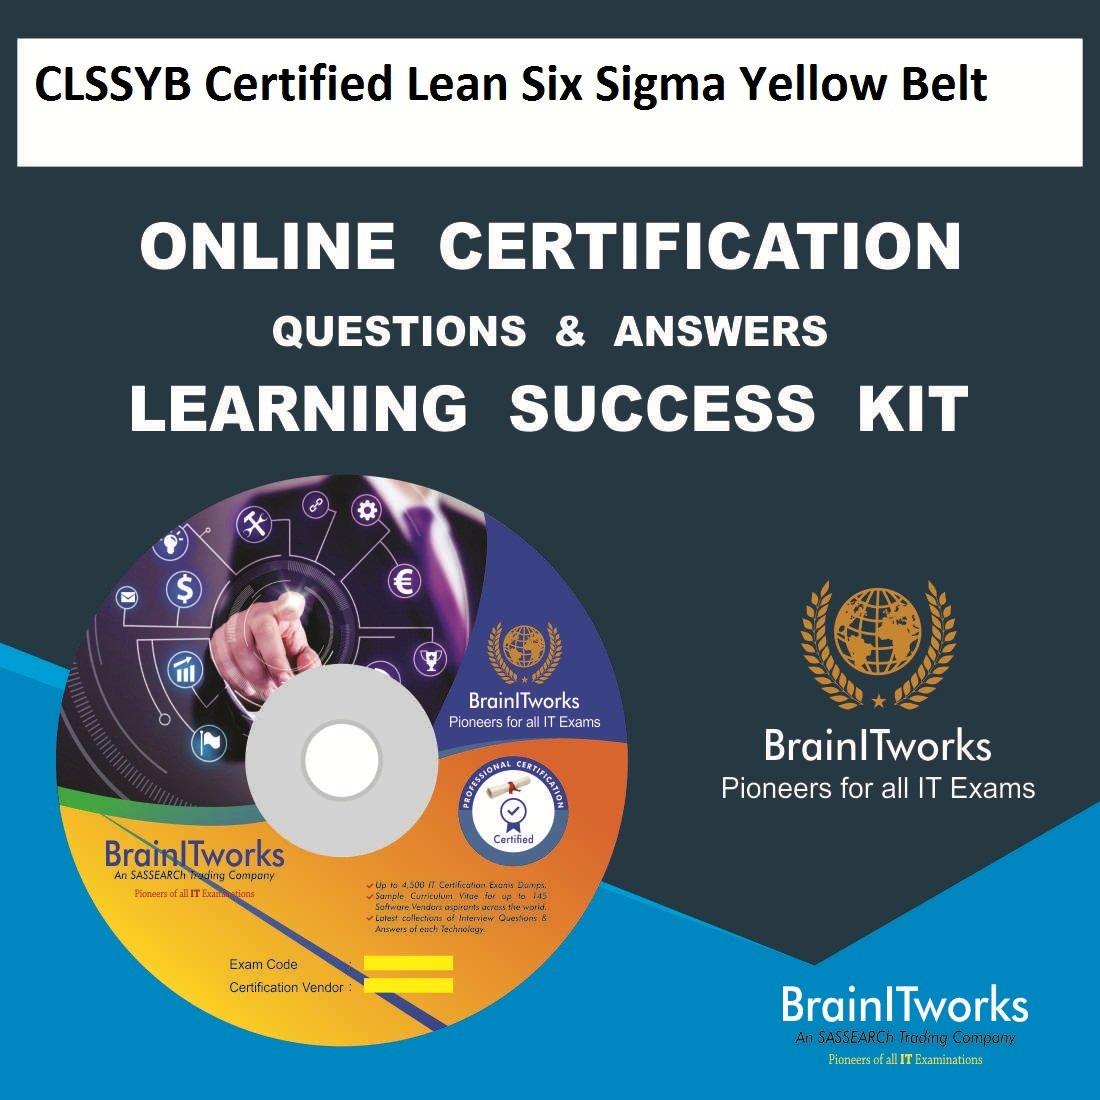 Clssyb Certified Lean Six Sigma Yellow Belt Online Certification